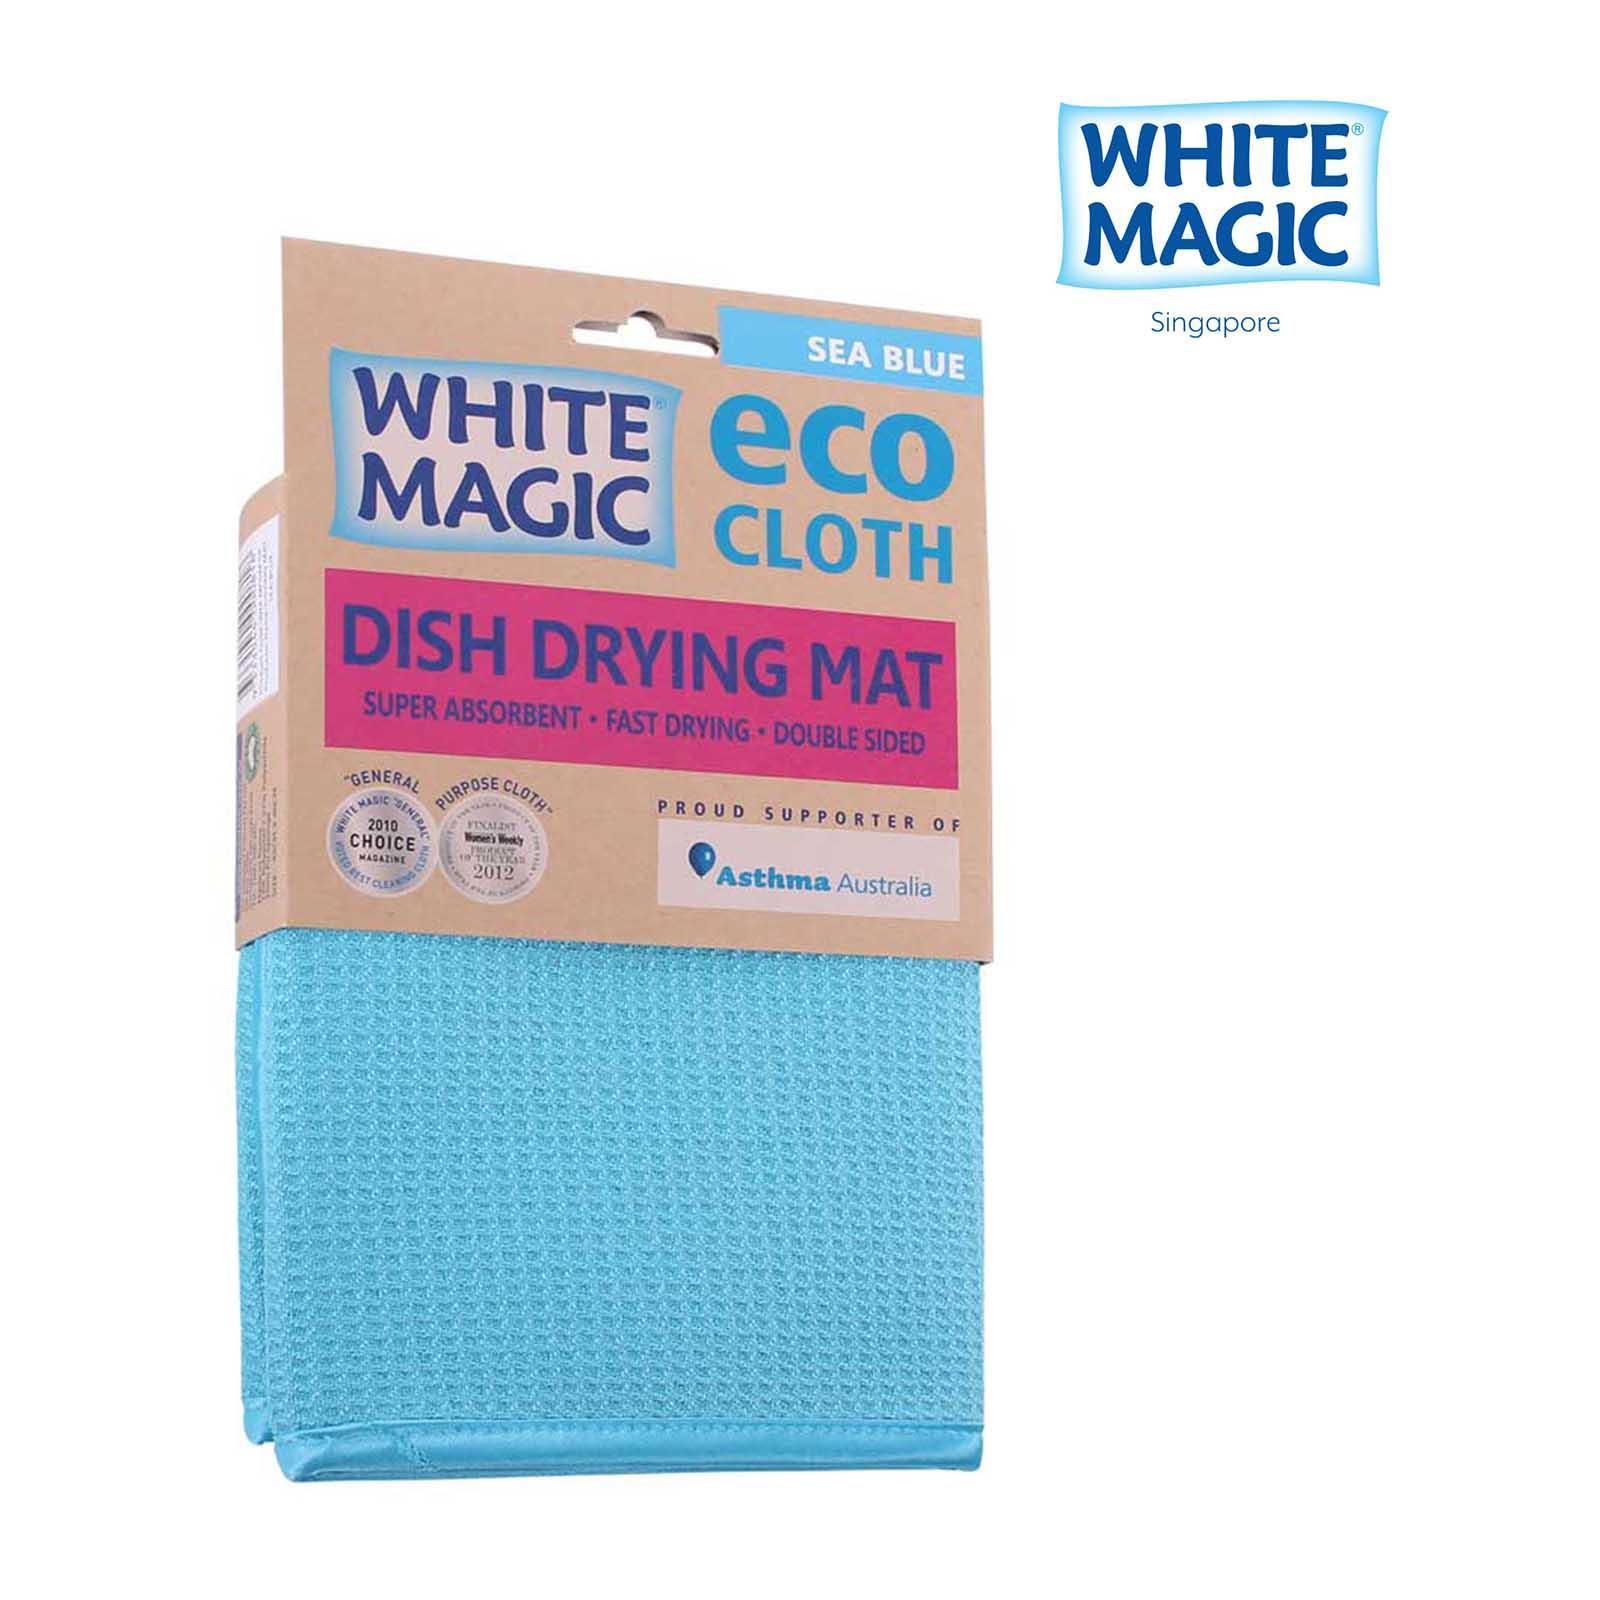 White Magic Dish Drying Mat Sea Blue